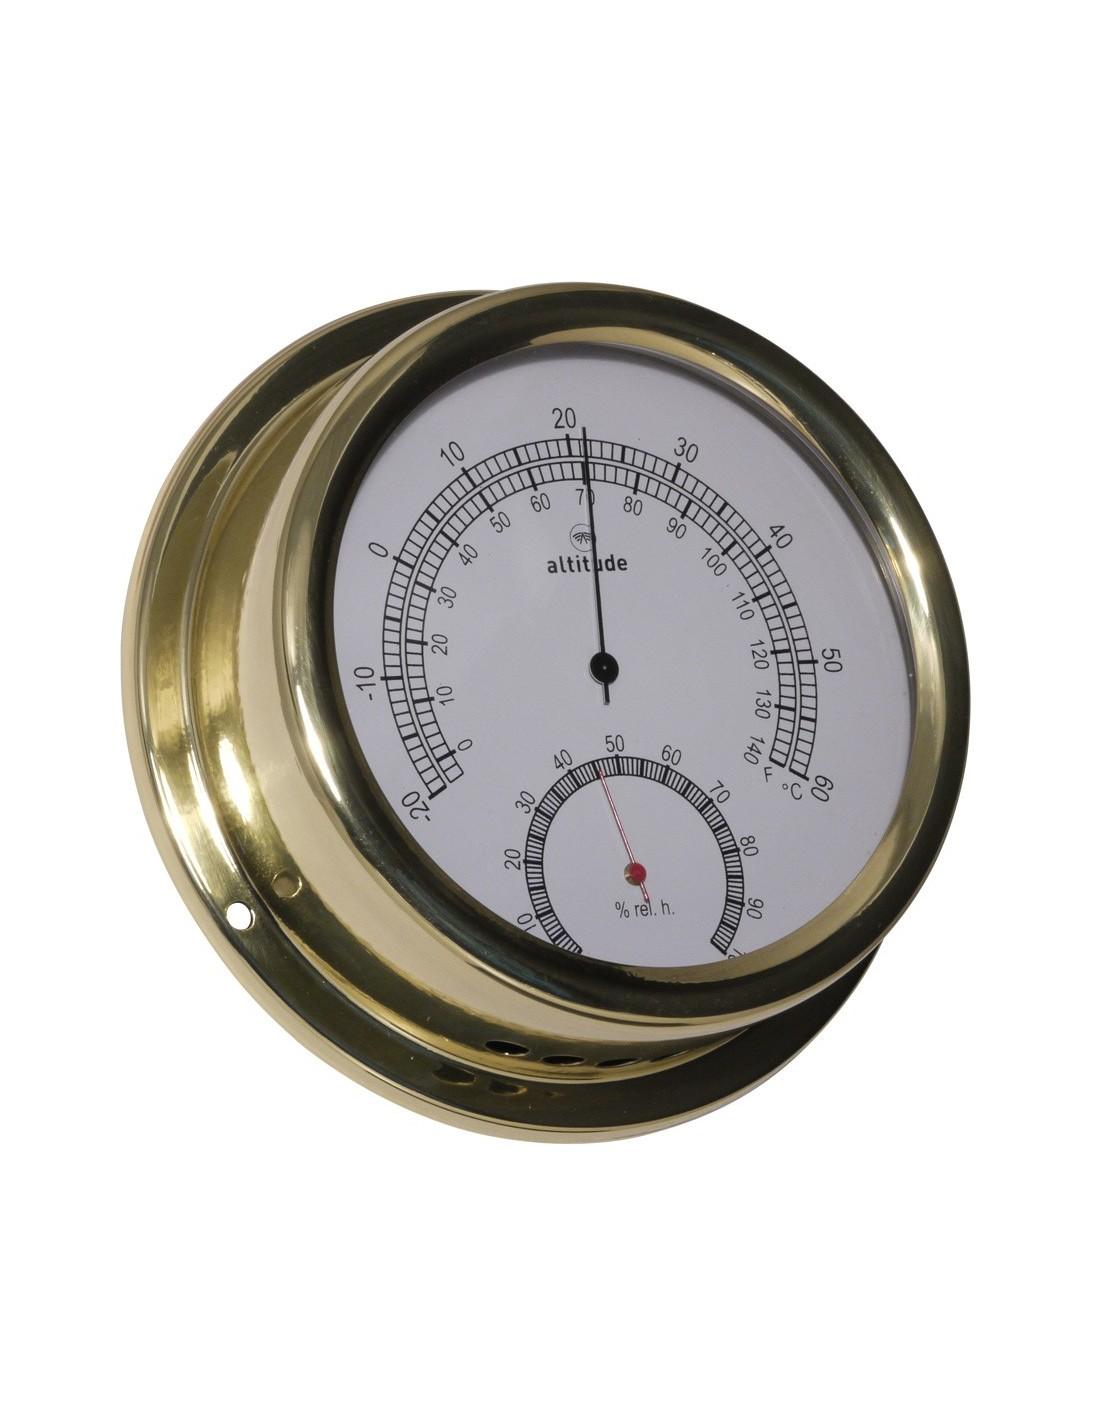 Thermometer / Hygrometer - 150 mm